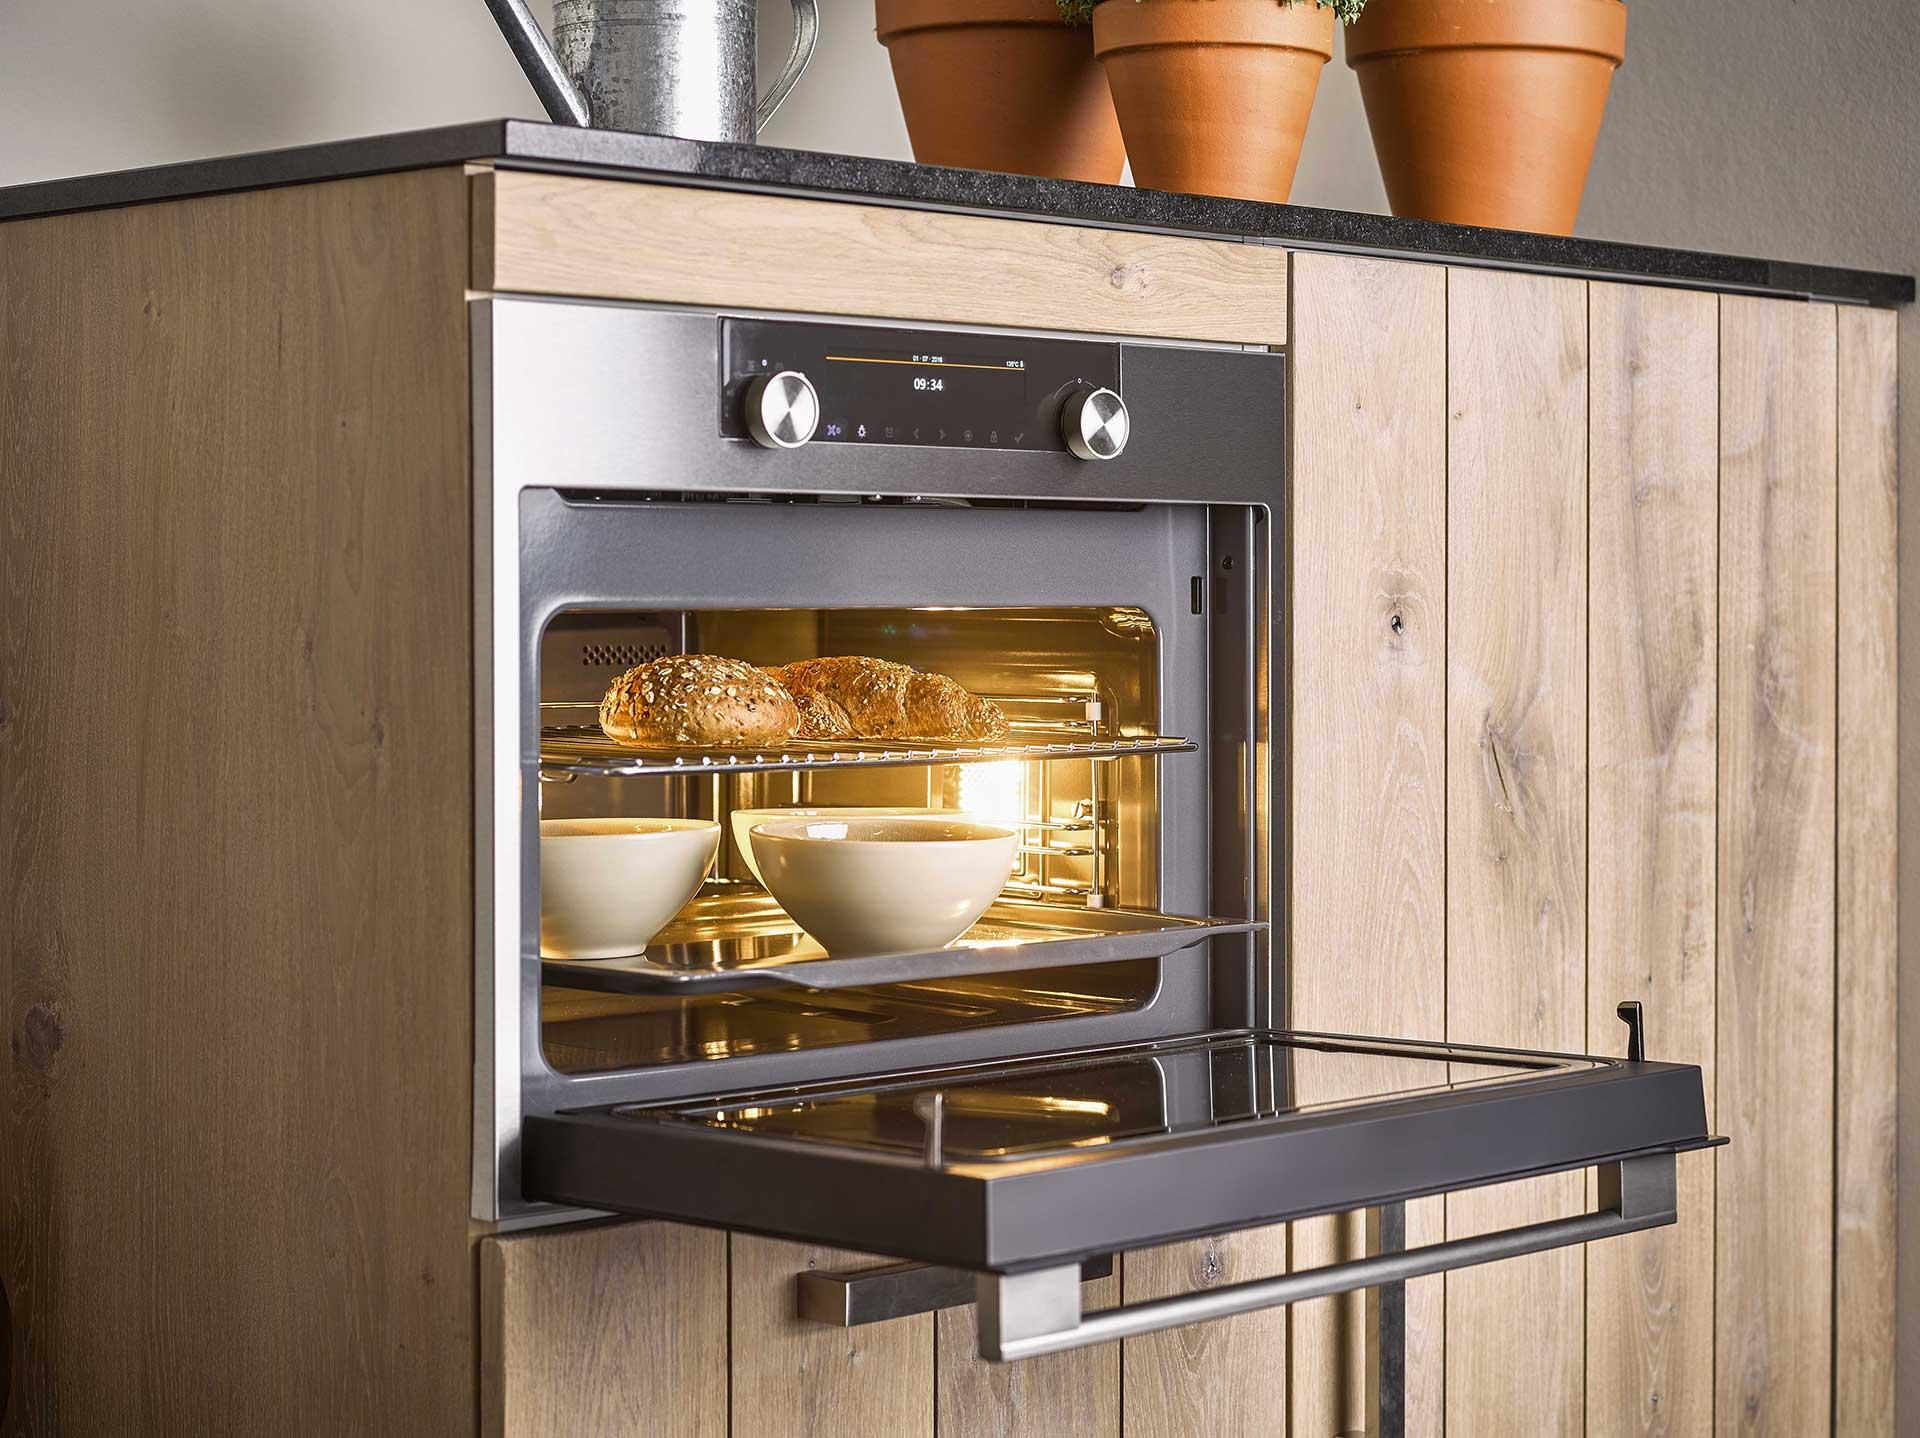 Enviroo-Keukens-UniekeKeuken_ATAG-1